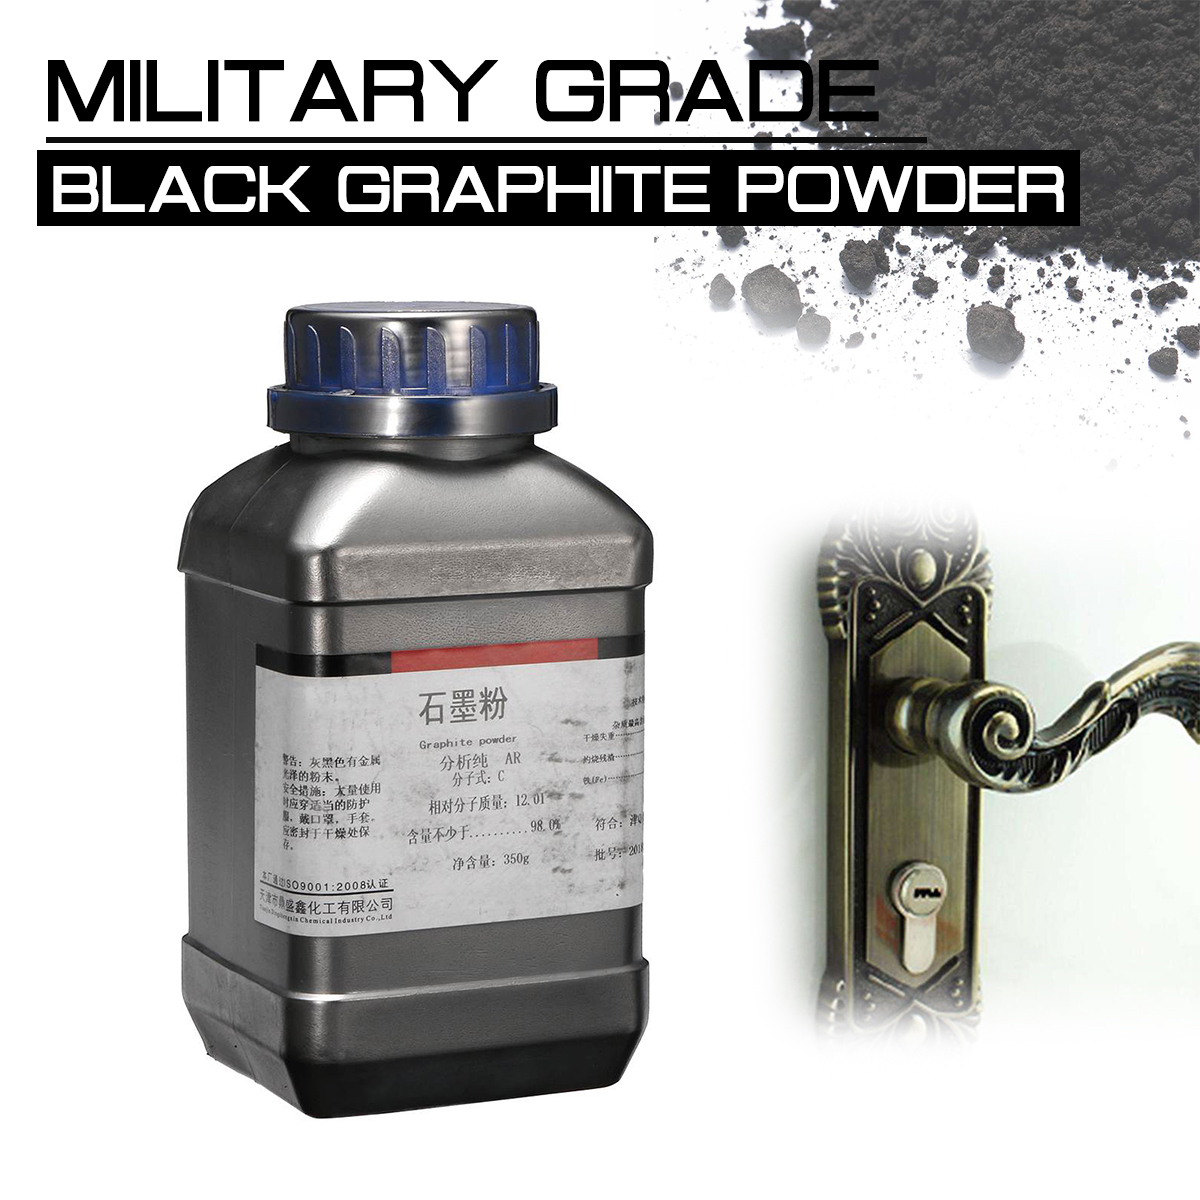 350g  5 Micron Ultra Fine 99.9% Non toxic New High Quality Graphite Powder Black Graphite Military Grade Powder Locksmith Supplies    - AliExpress